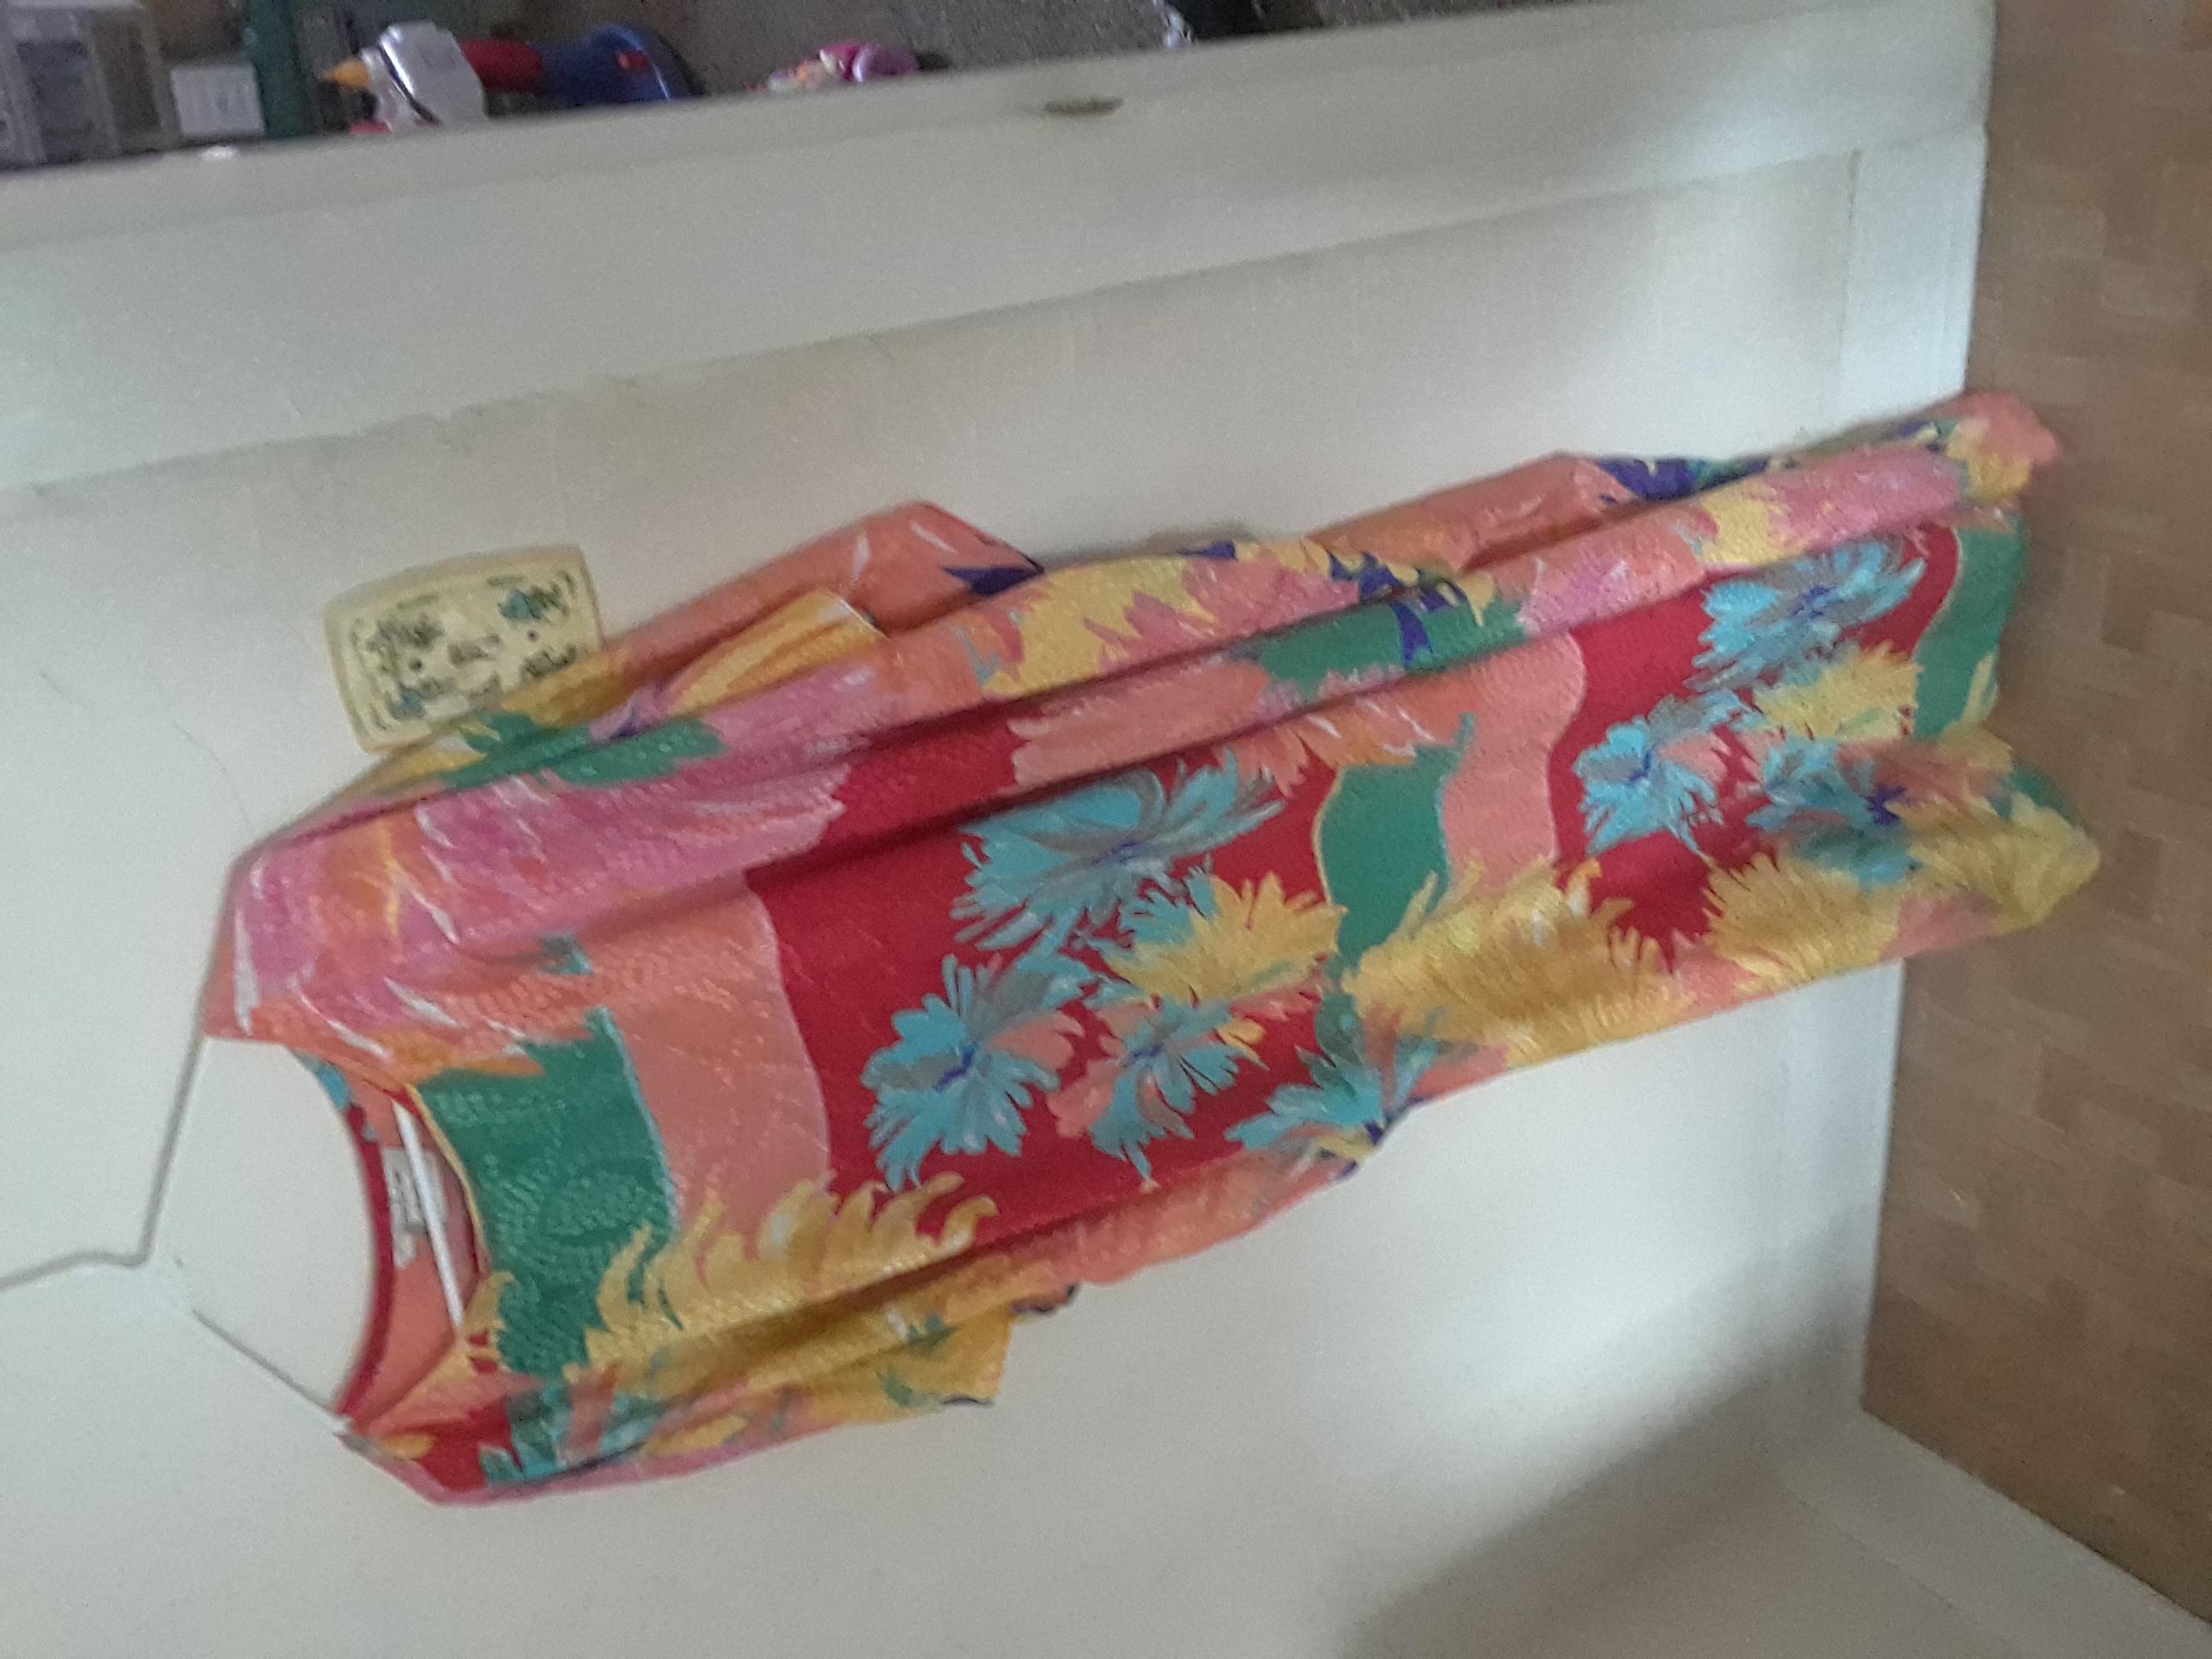 VIBRANT Silk Robe Dress (slightly see-through)